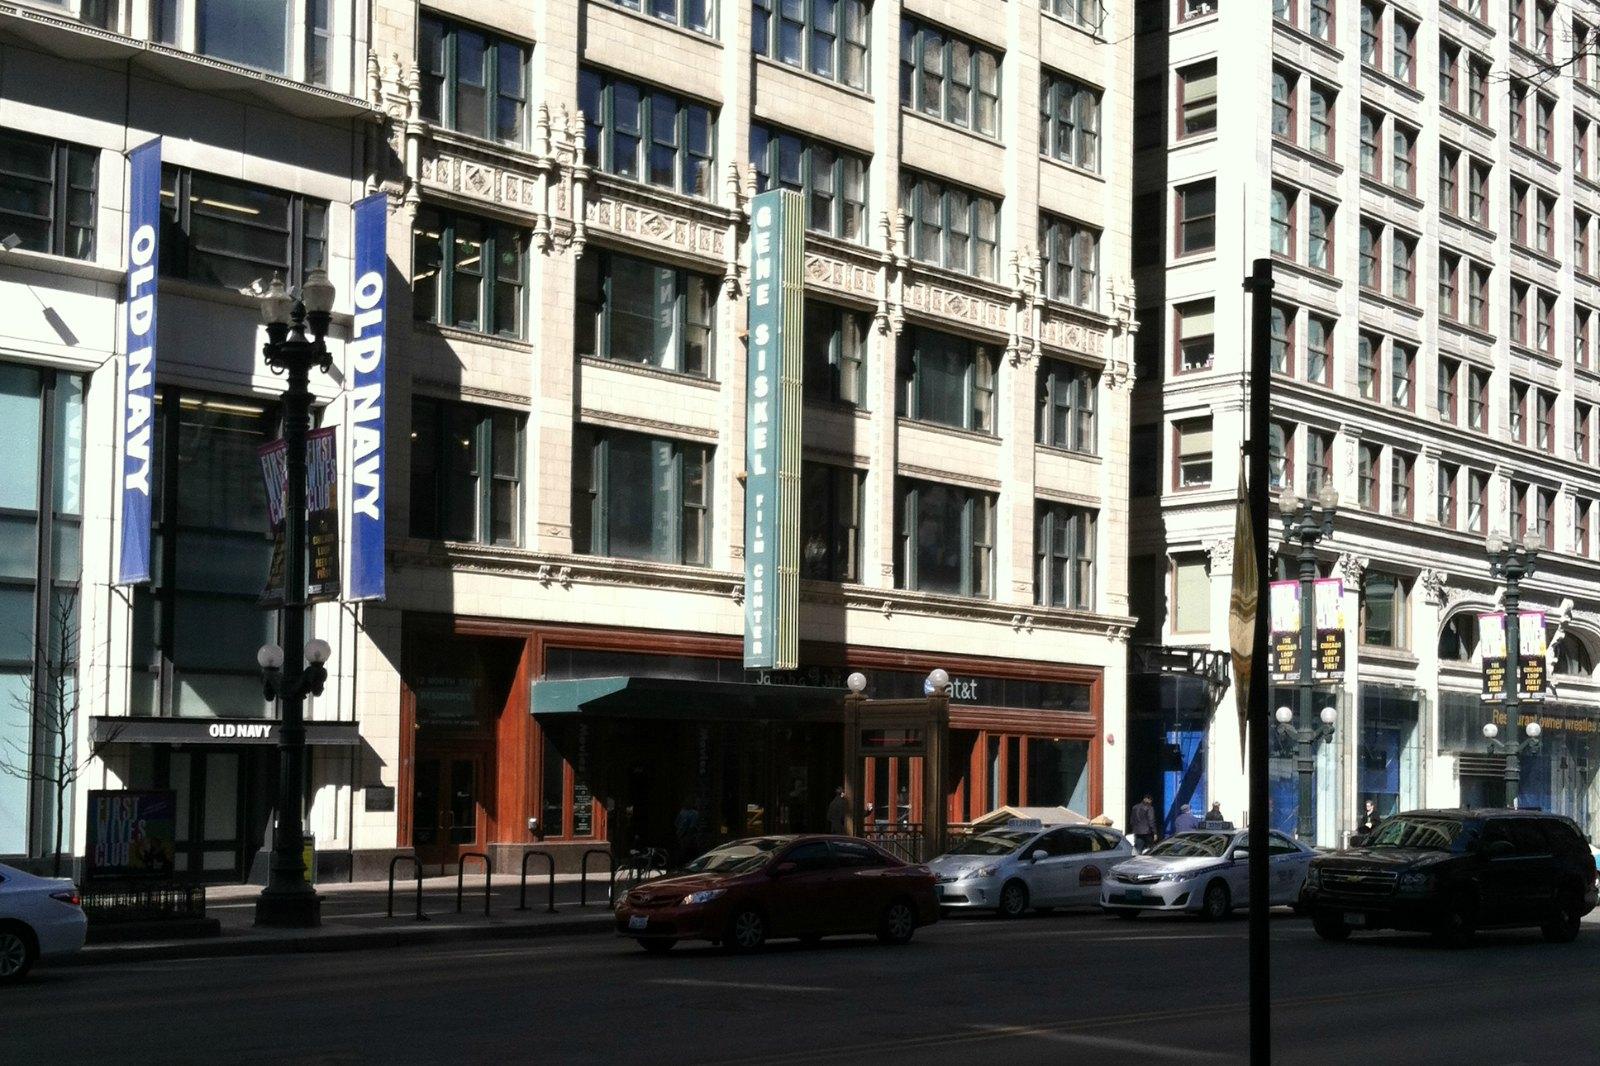 Discount admission to Gene Siskel Film Center